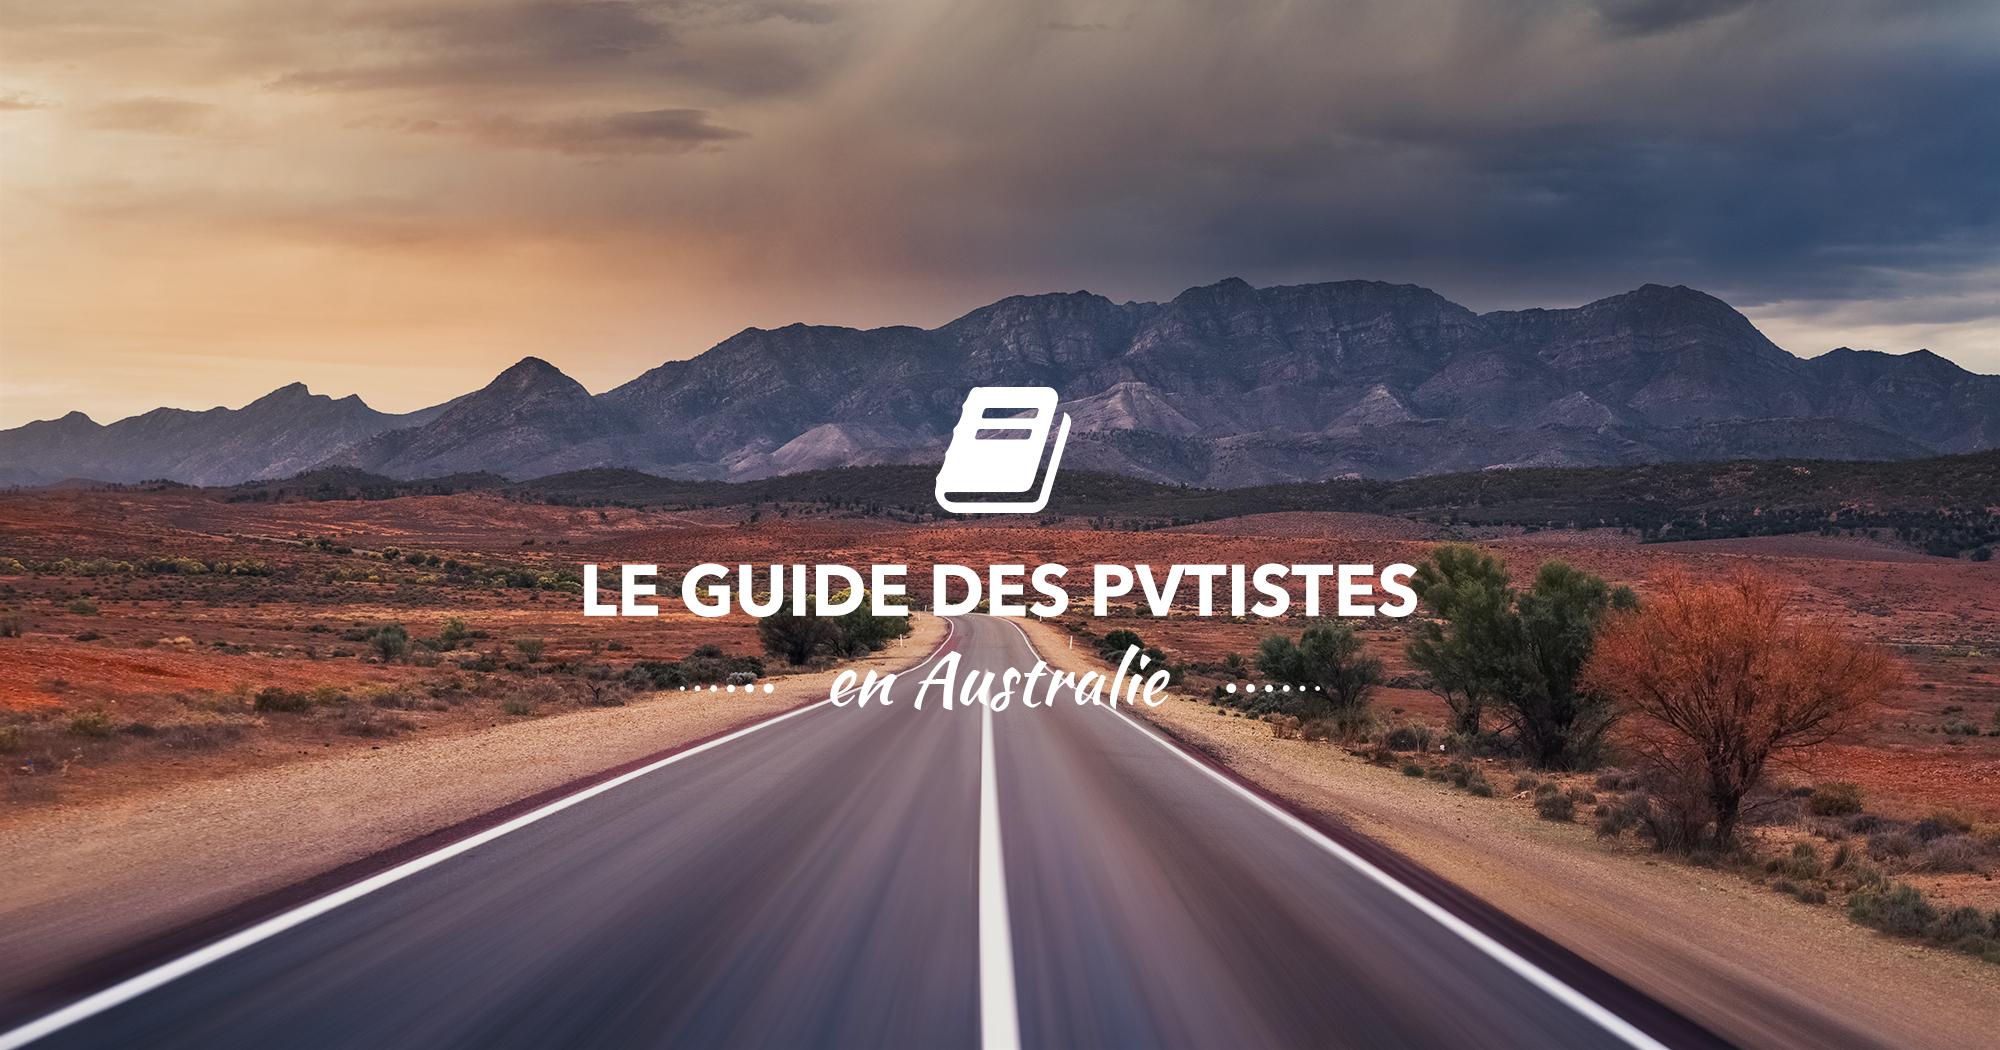 visuels-dossiers-whv-australie-guide-pvtistes